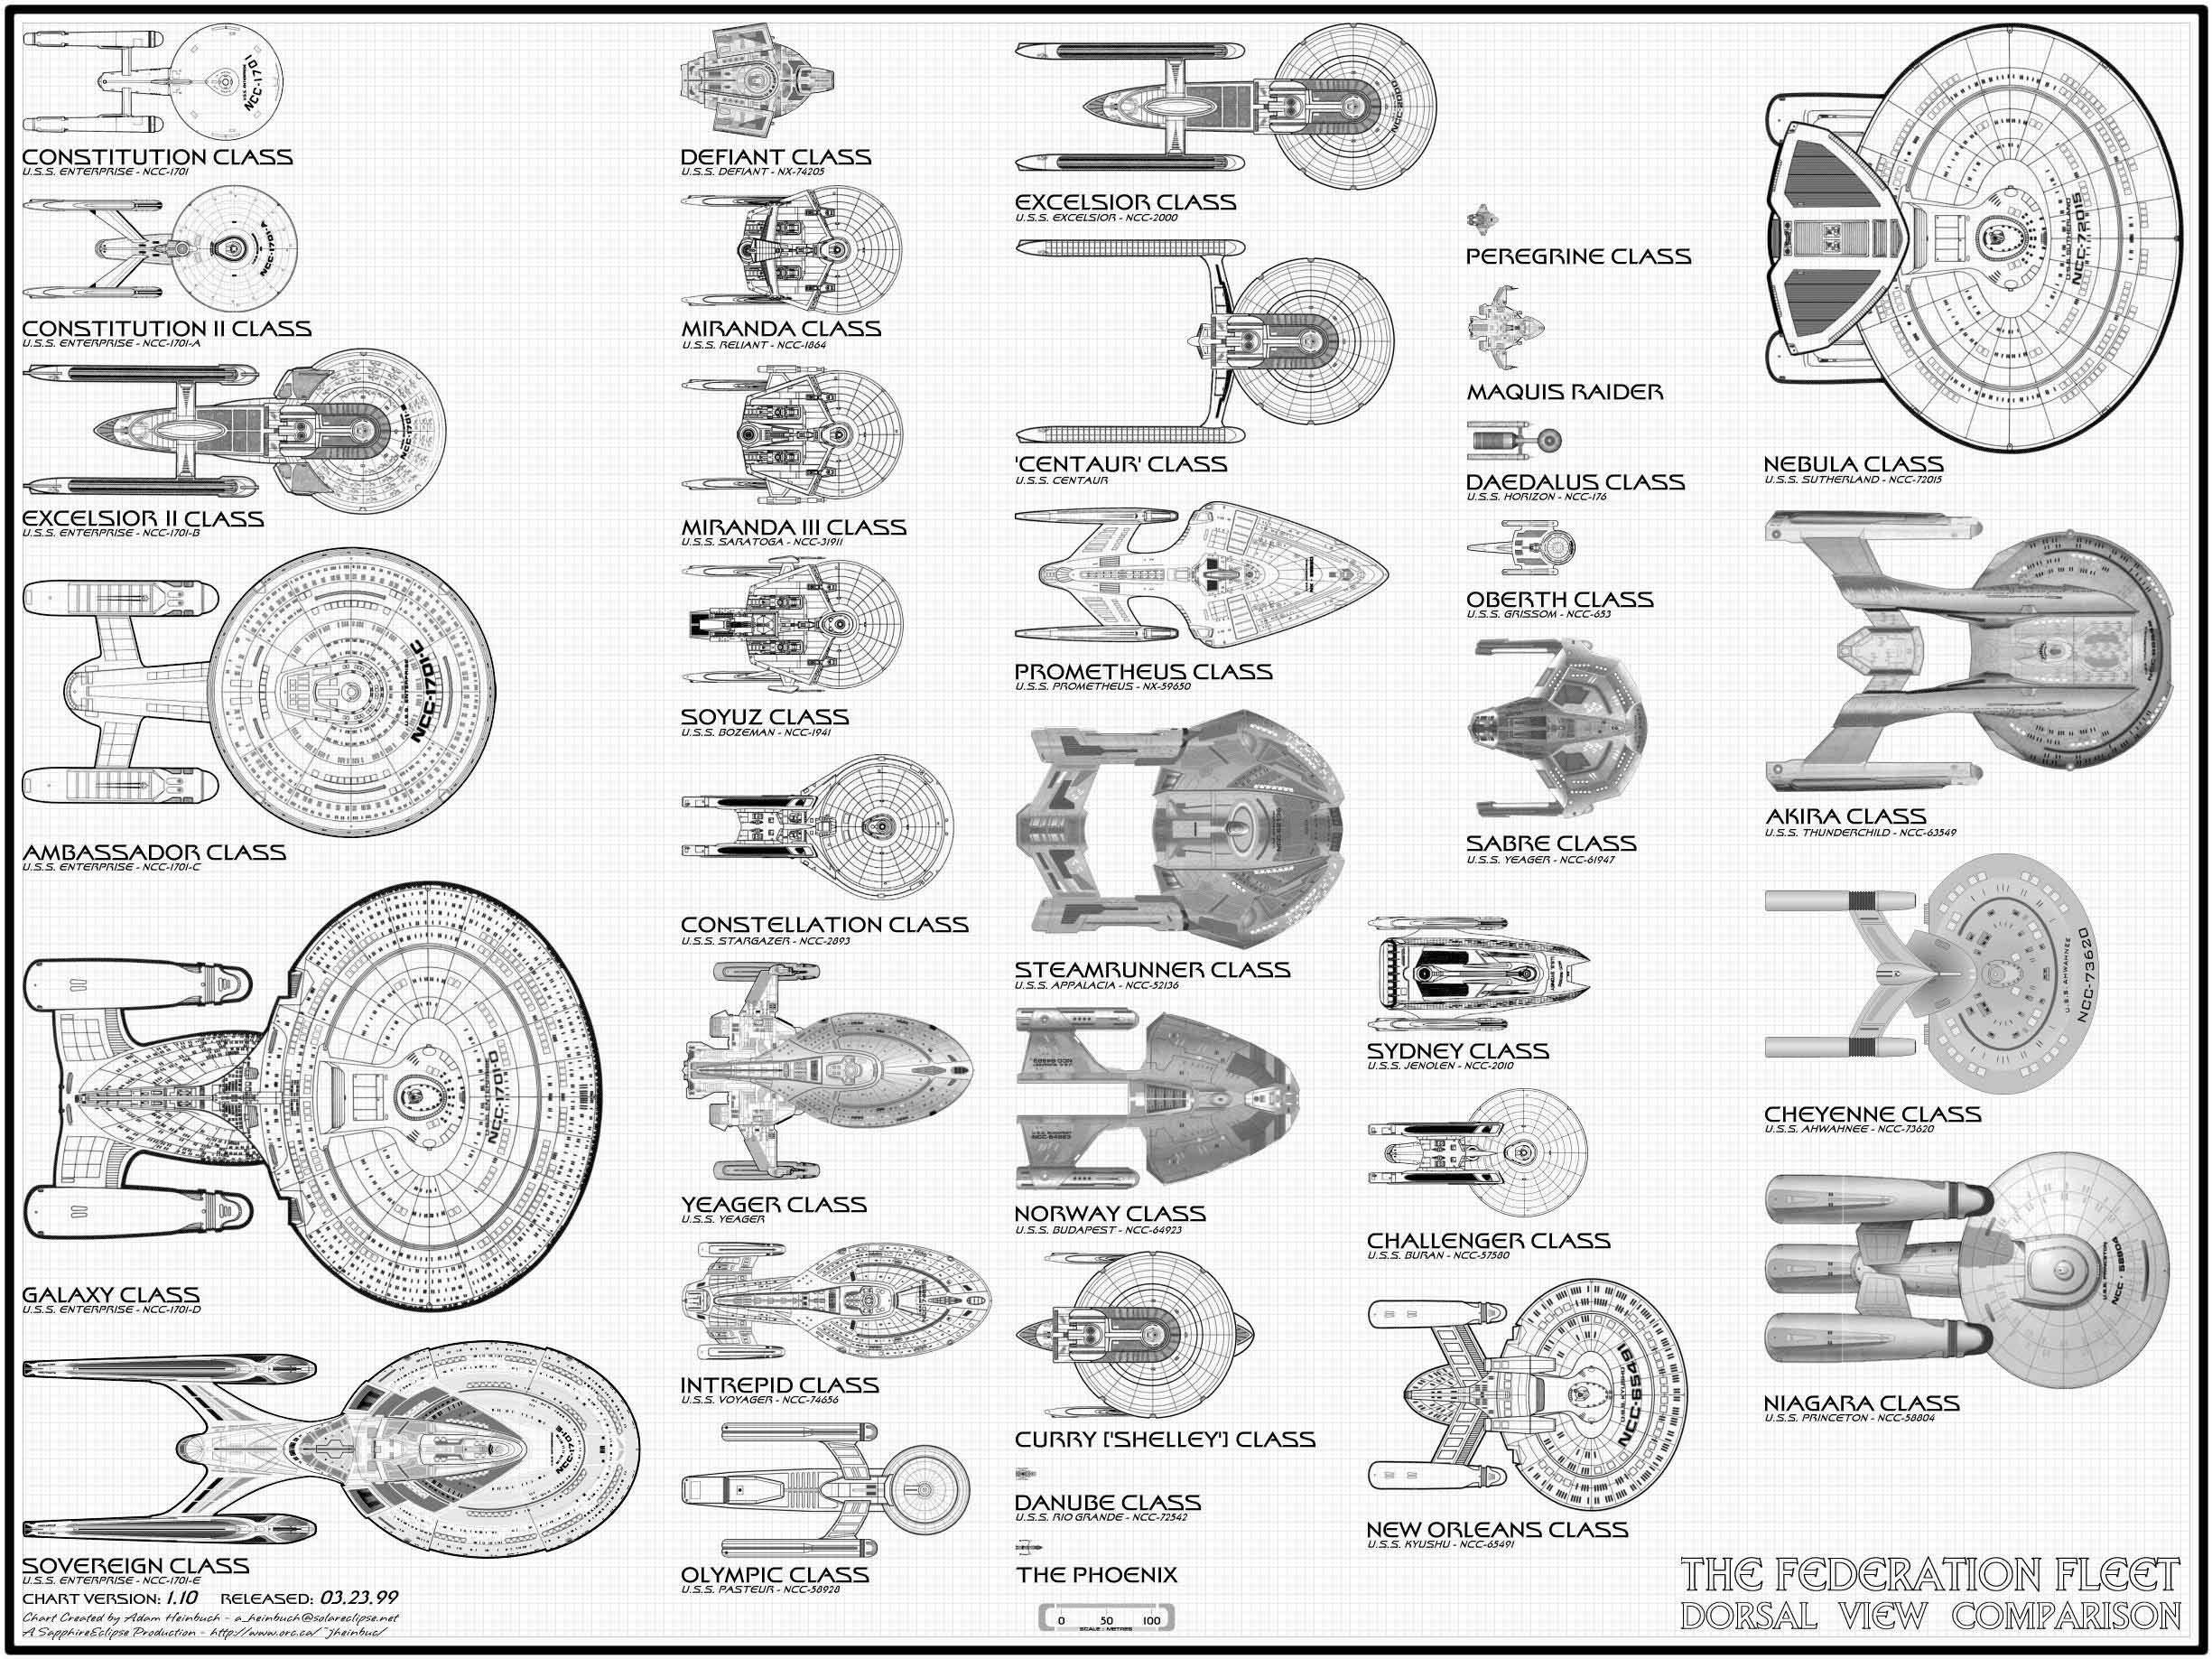 Star Trek Federation Fleet Starships Size Comparison